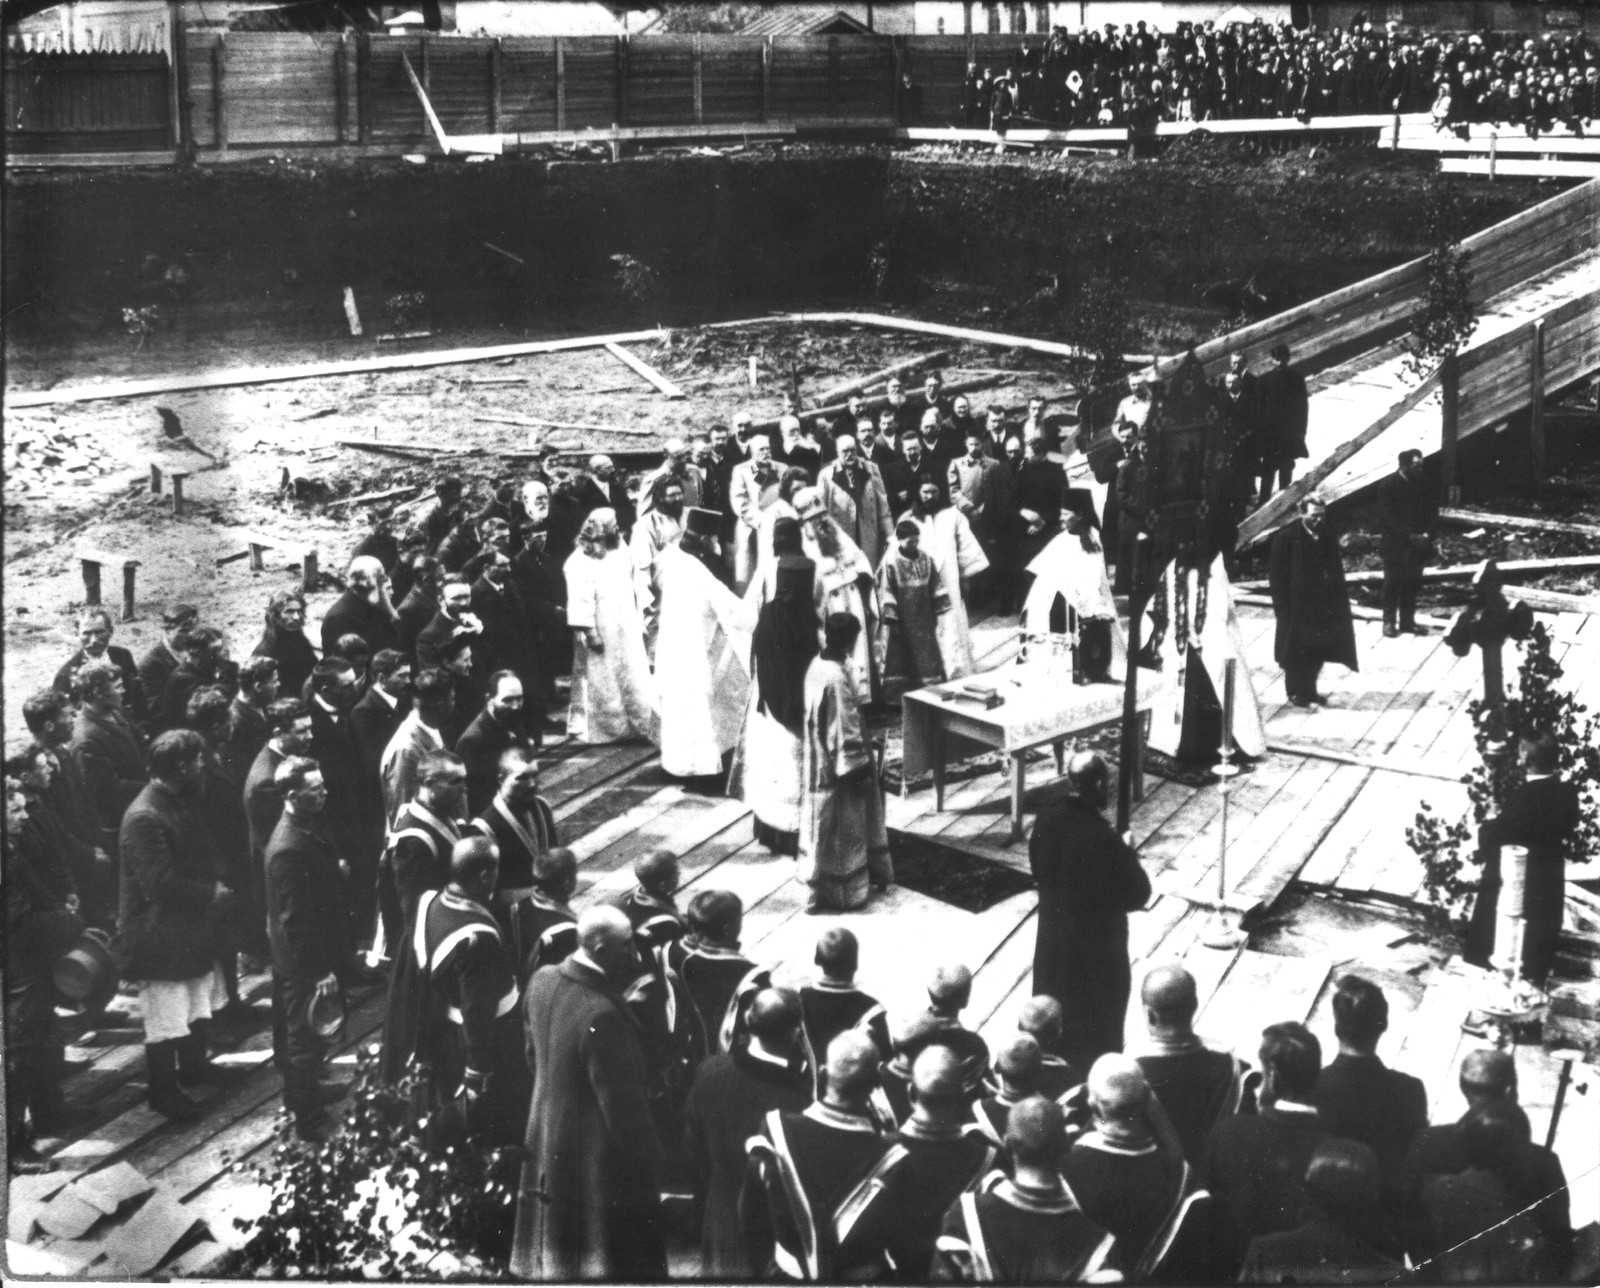 03. 1911. Закладка фундамента Феодоровского собора